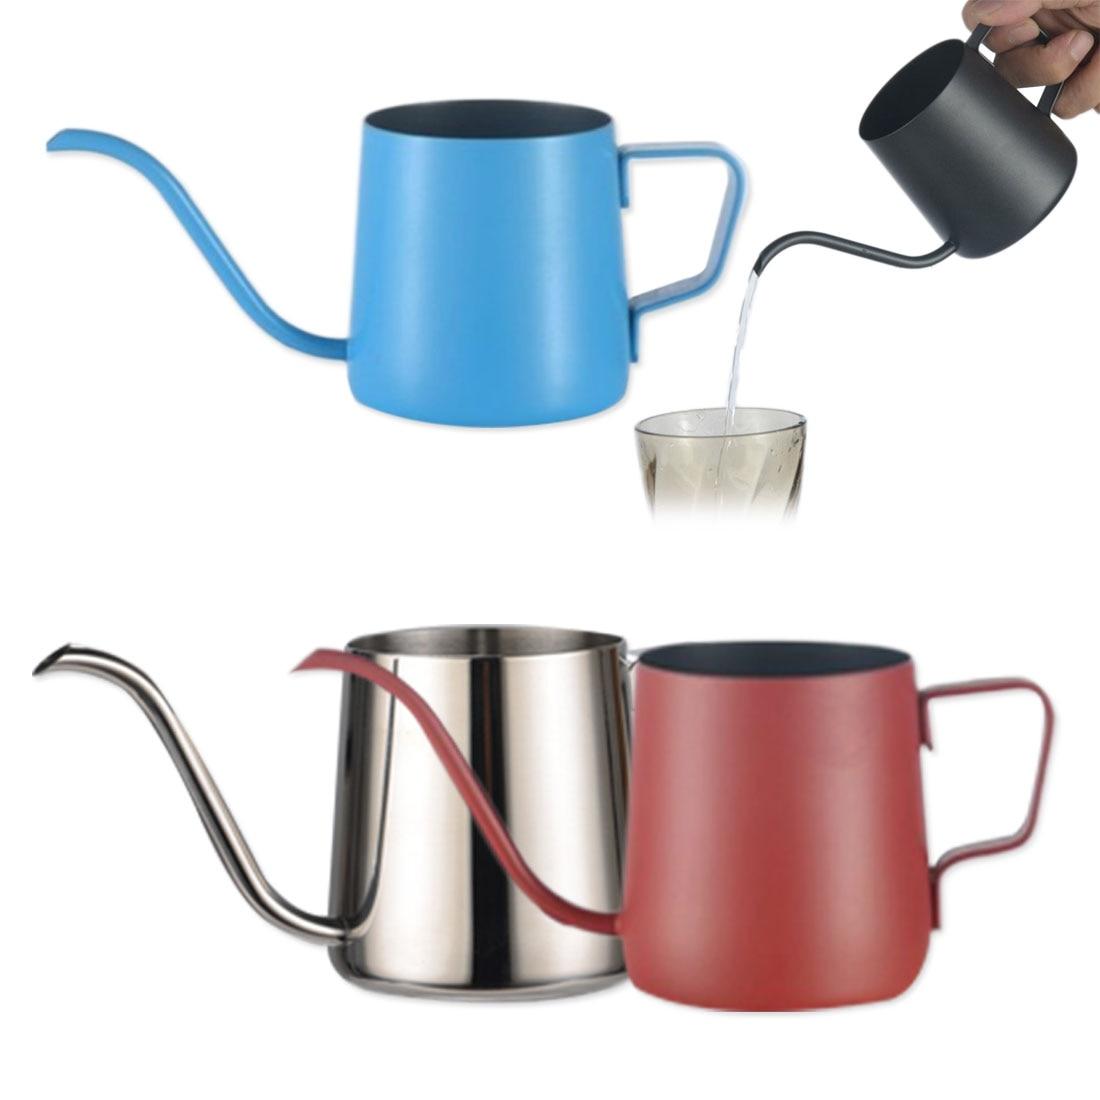 1pc soporte de montaje de acero inoxidable mano golpe olla café macetas con tapa de goteo de cuello de pico boca larga tetera café tetera